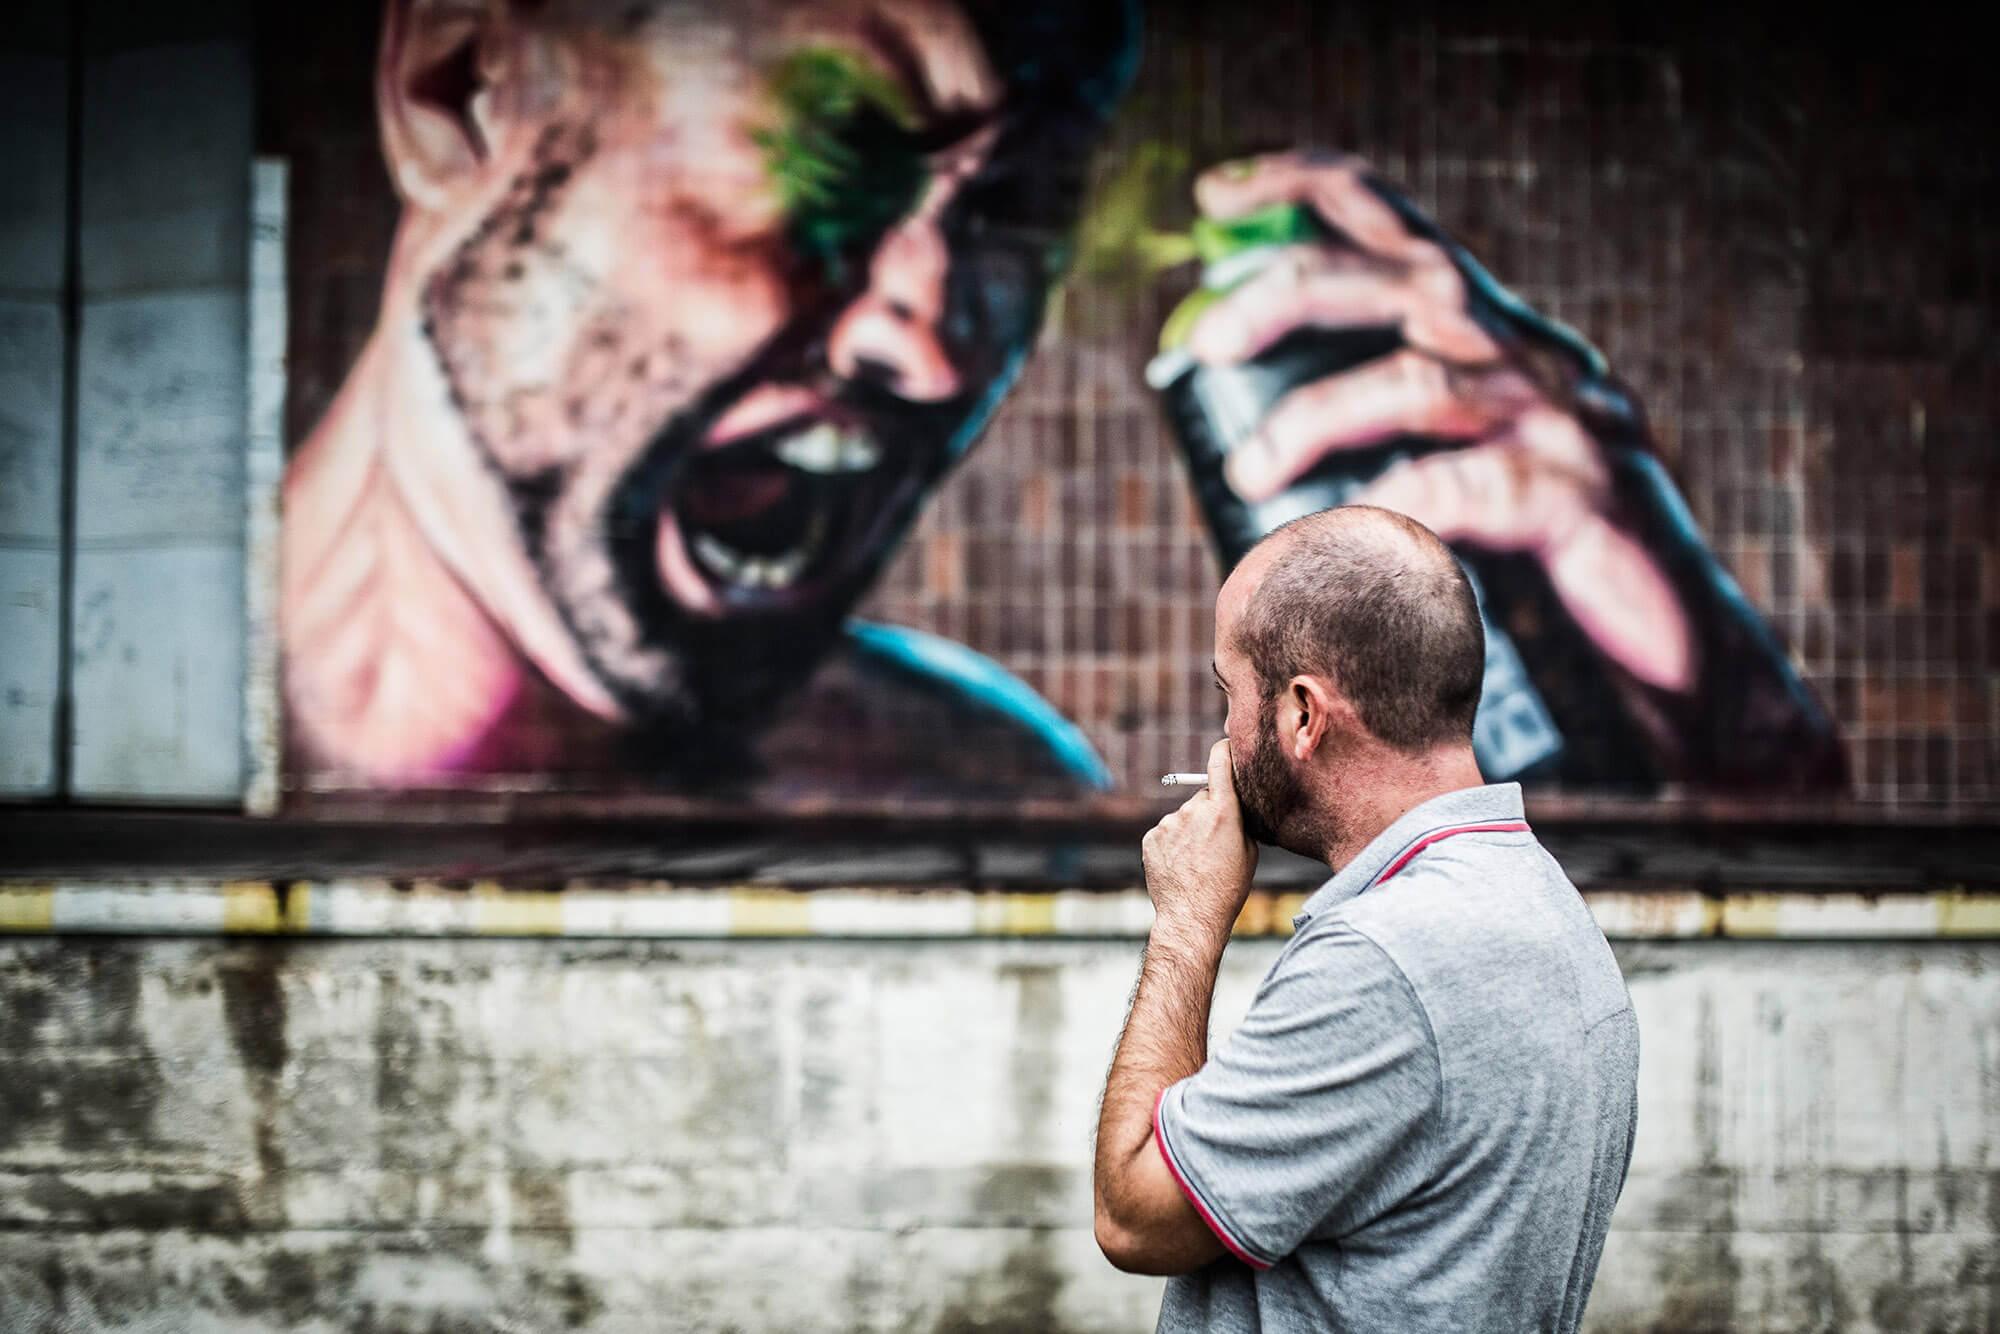 shed erich willner artist streetart flap photography fotograf philipp greindl photographer linz austria